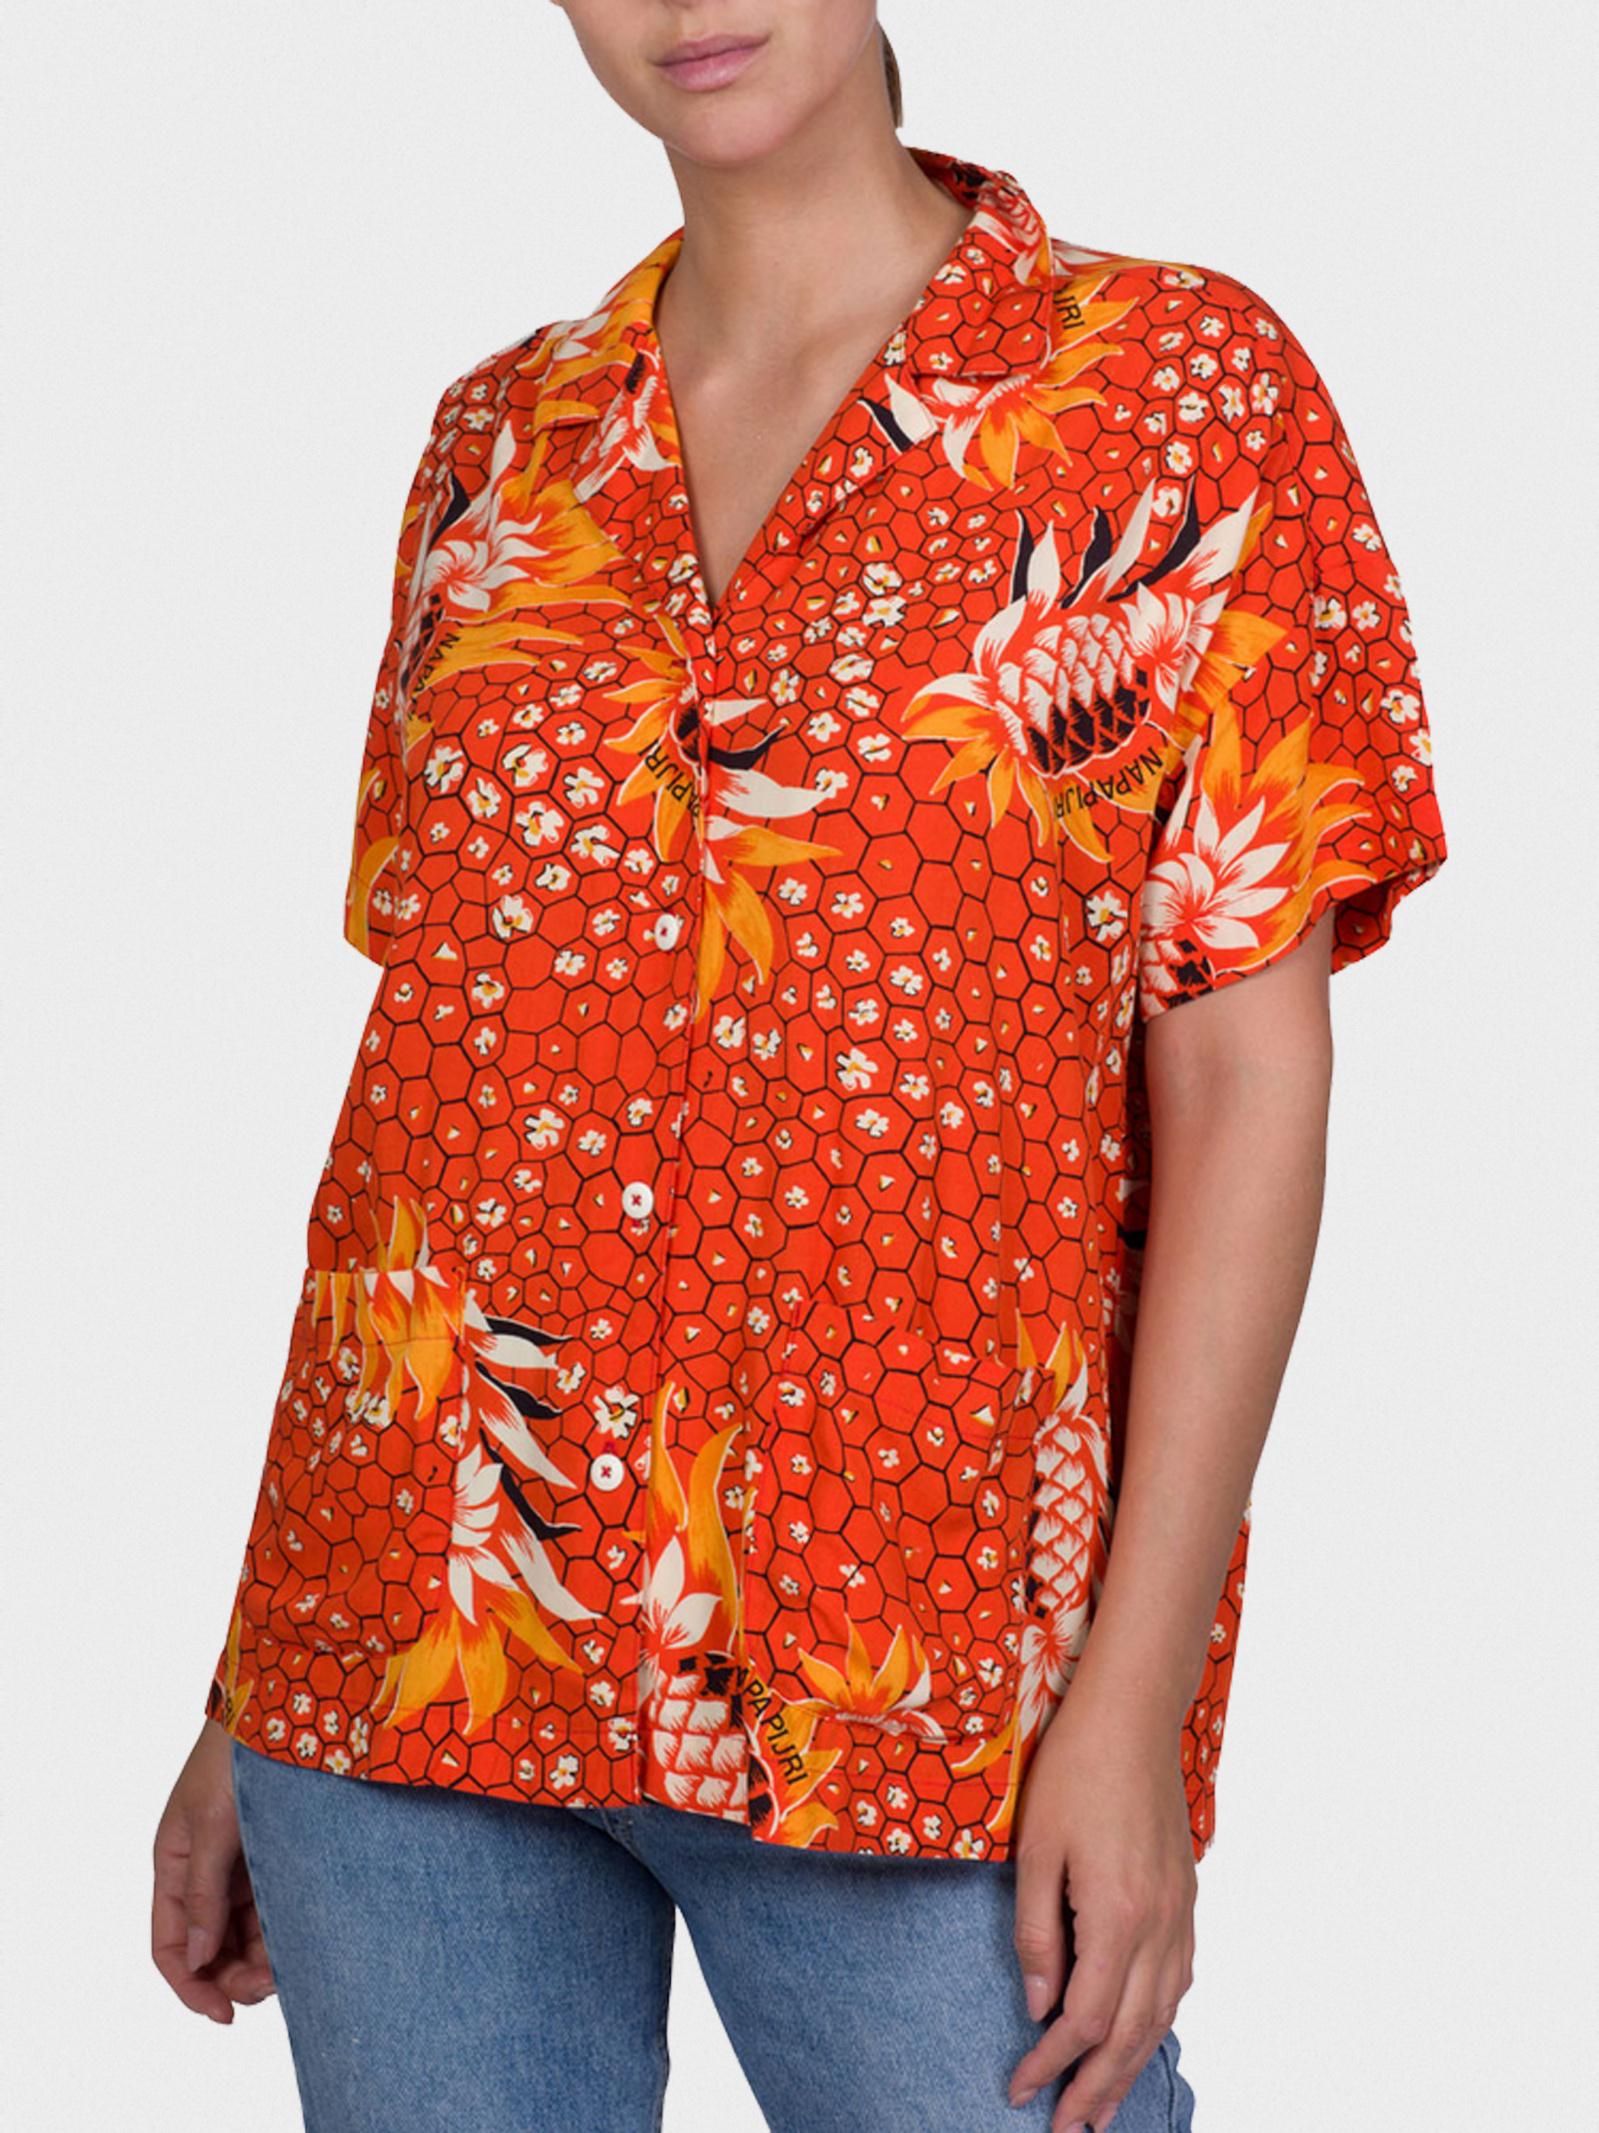 Рубашка женские Napapijri модель ZL1318 купить, 2017